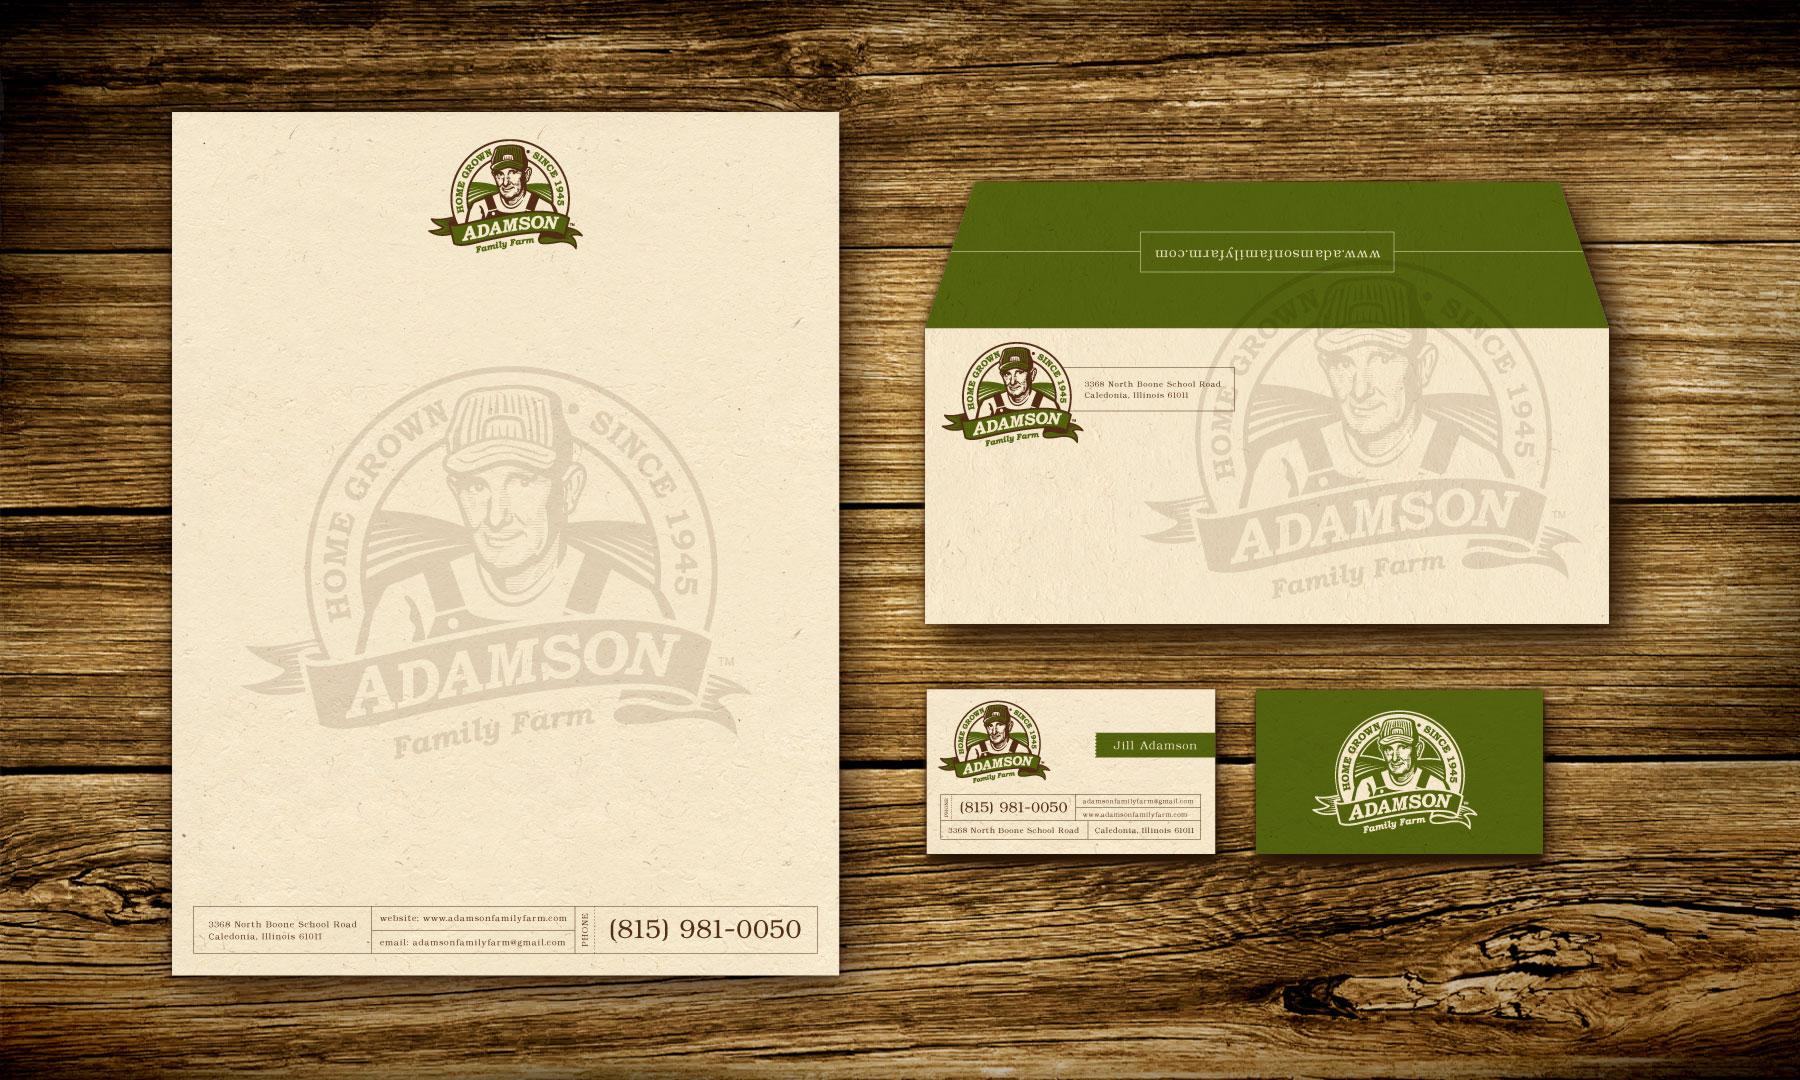 Adamson branding identity design